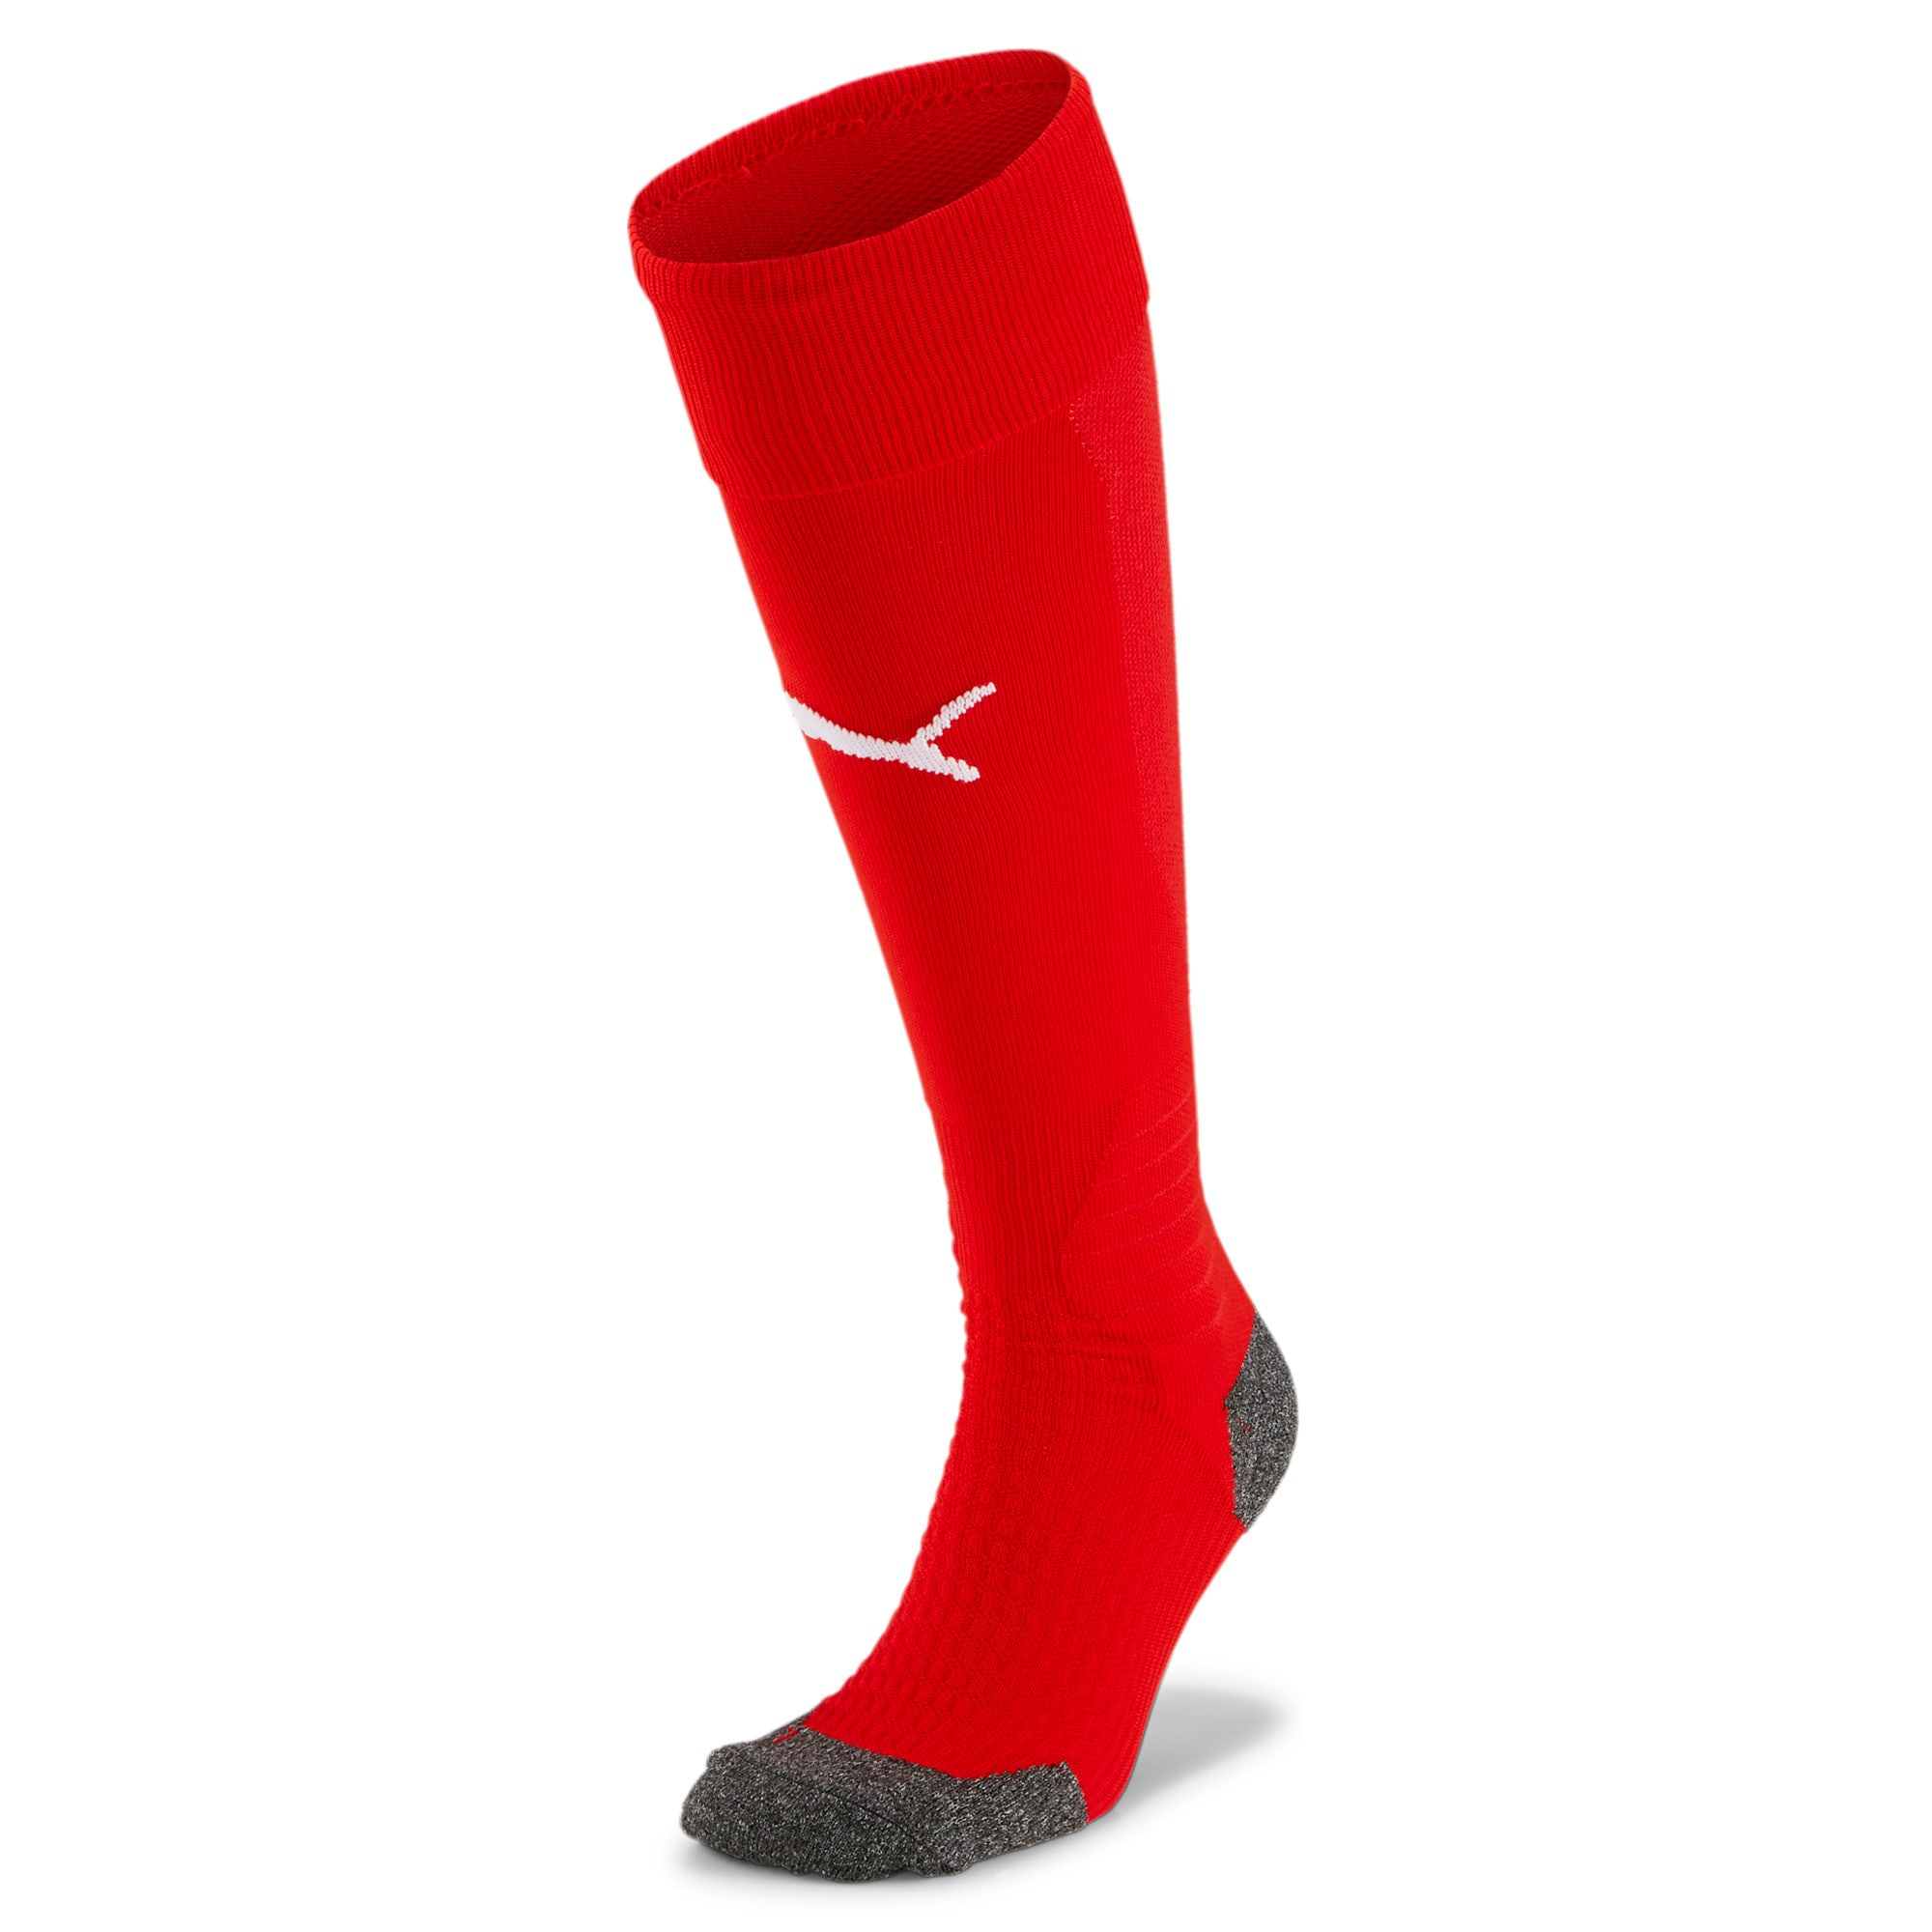 Thumbnail 1 of Liga Football Socks, Puma Red-Puma White, medium